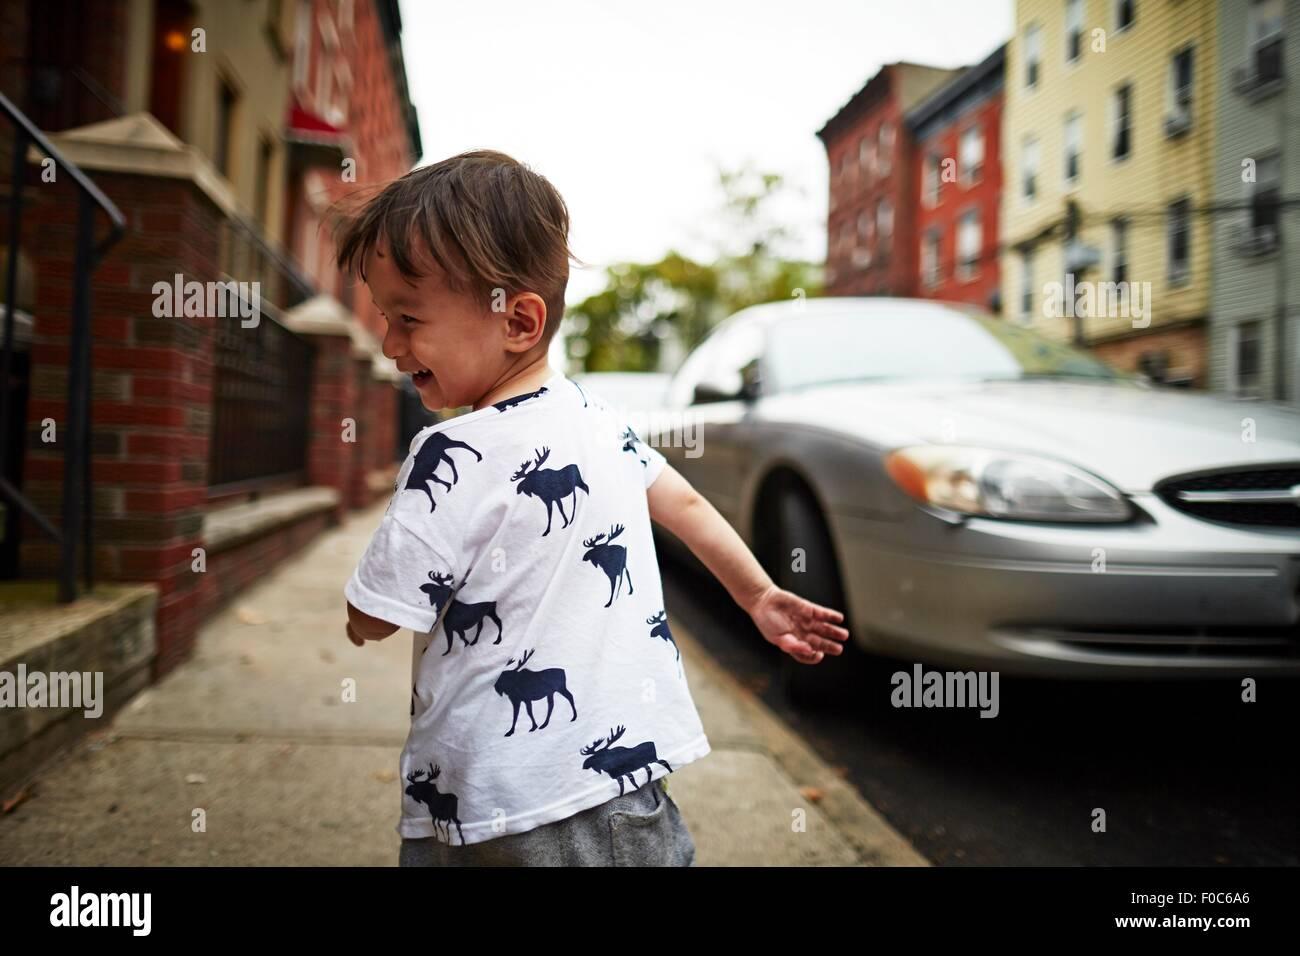 Boy running down street - Stock Image